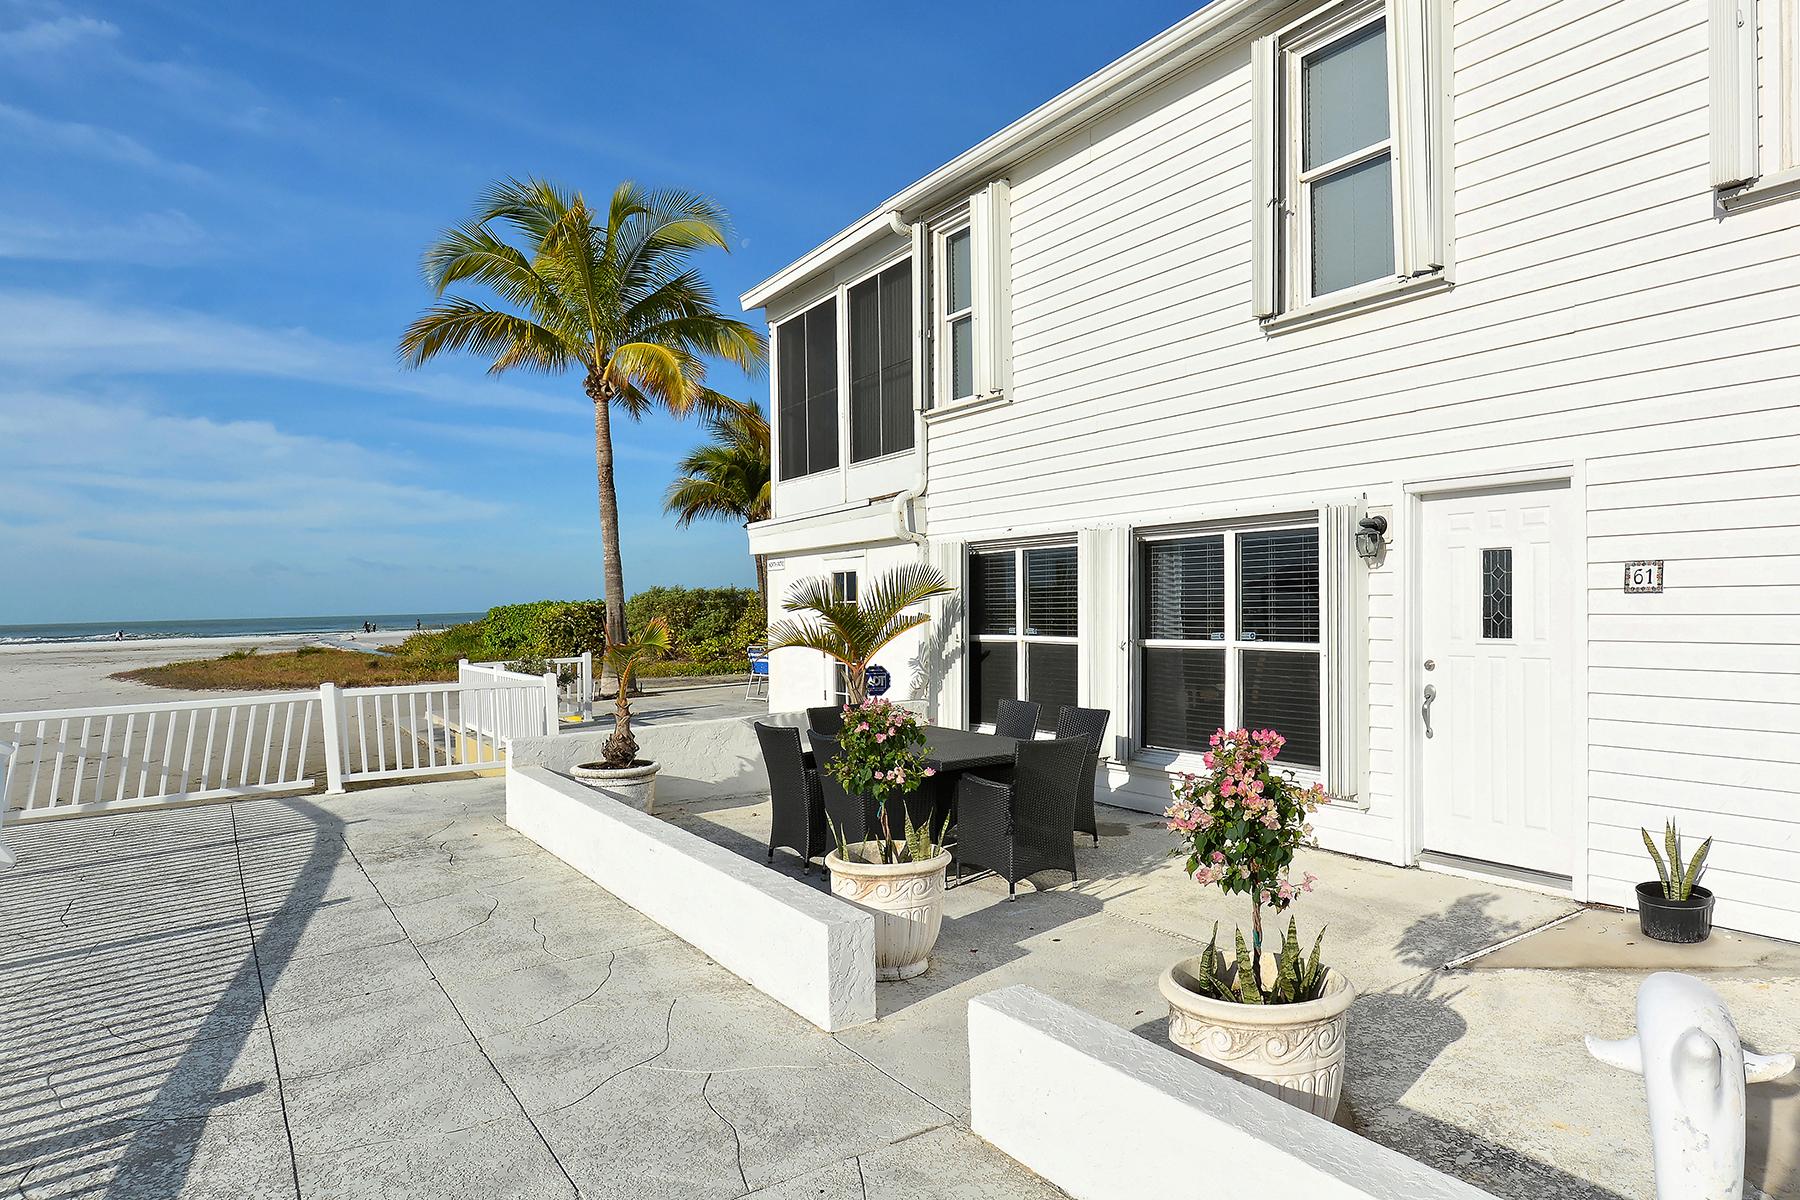 Condominium for Sale at SARASOTA 5858 Midnight Pass Rd 61 Sarasota, Florida, 34242 United States